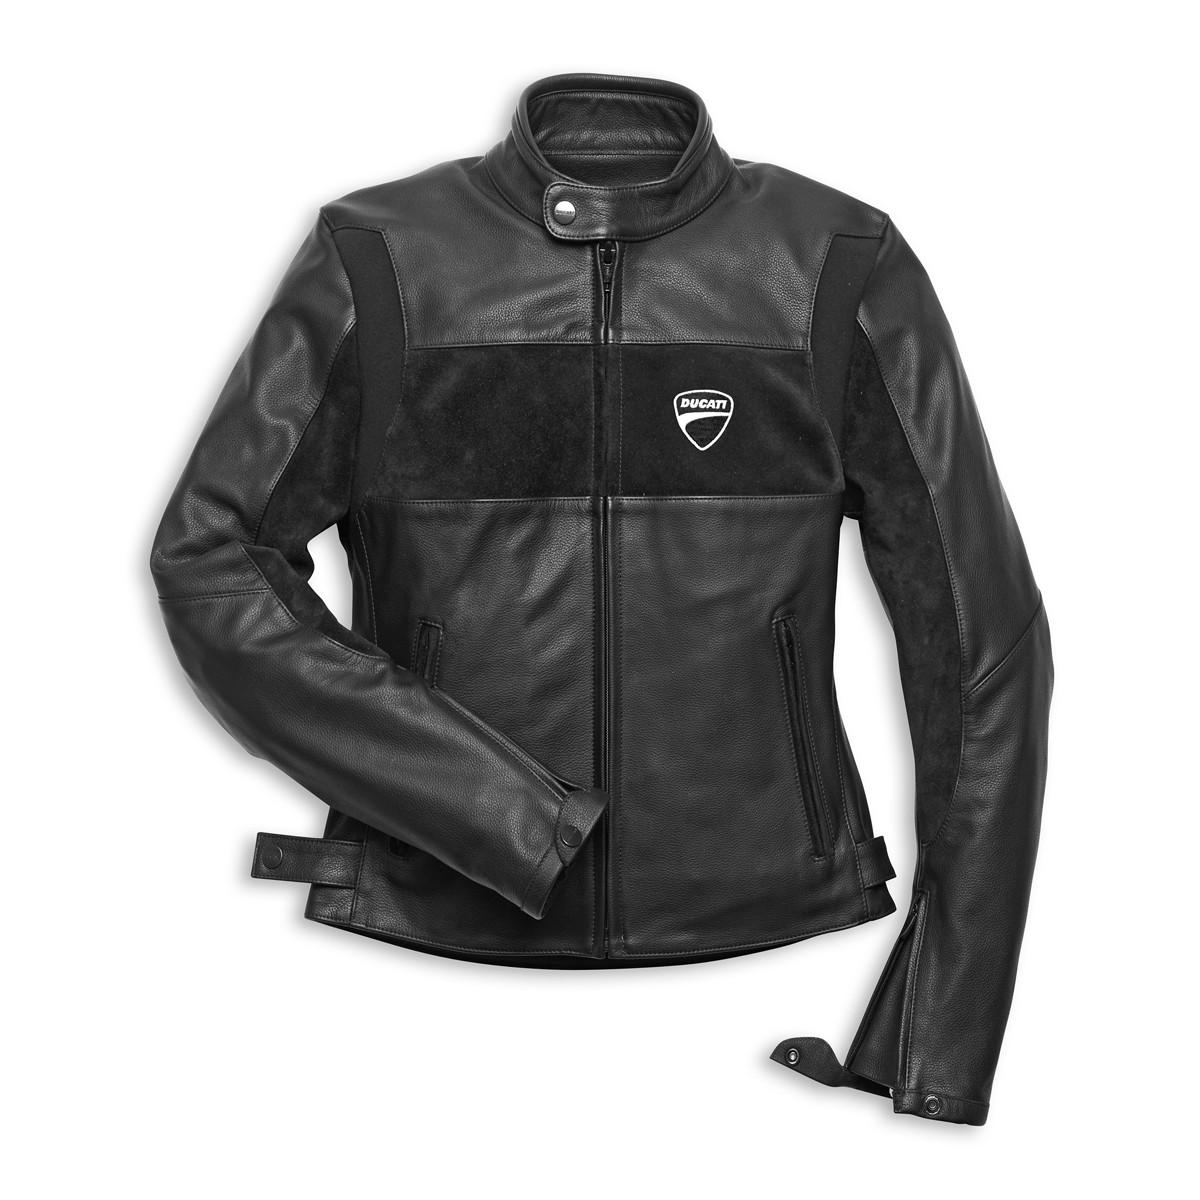 womens ducati leather jackets - ducati store uk